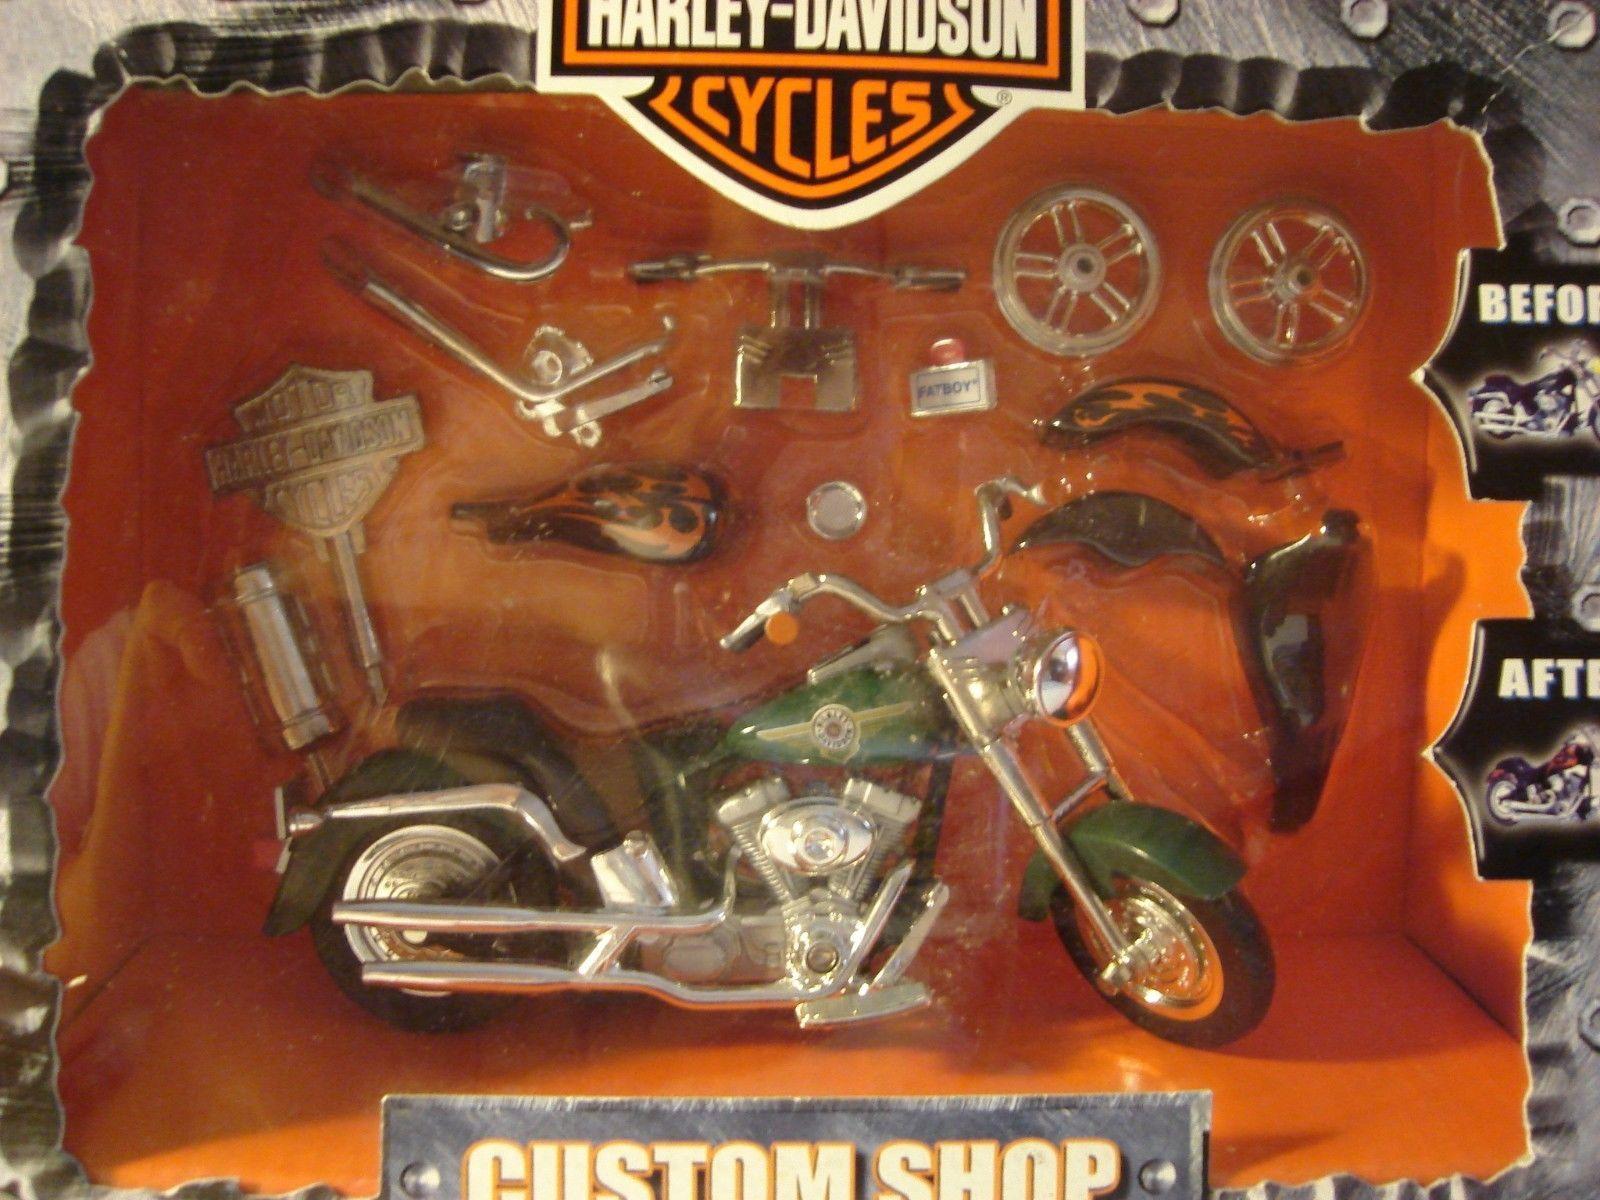 Harley Davidson 1 20 Die Cast Motorcycle Fatboy Custom Shop Ebay Harley Davidson Davidson Harley